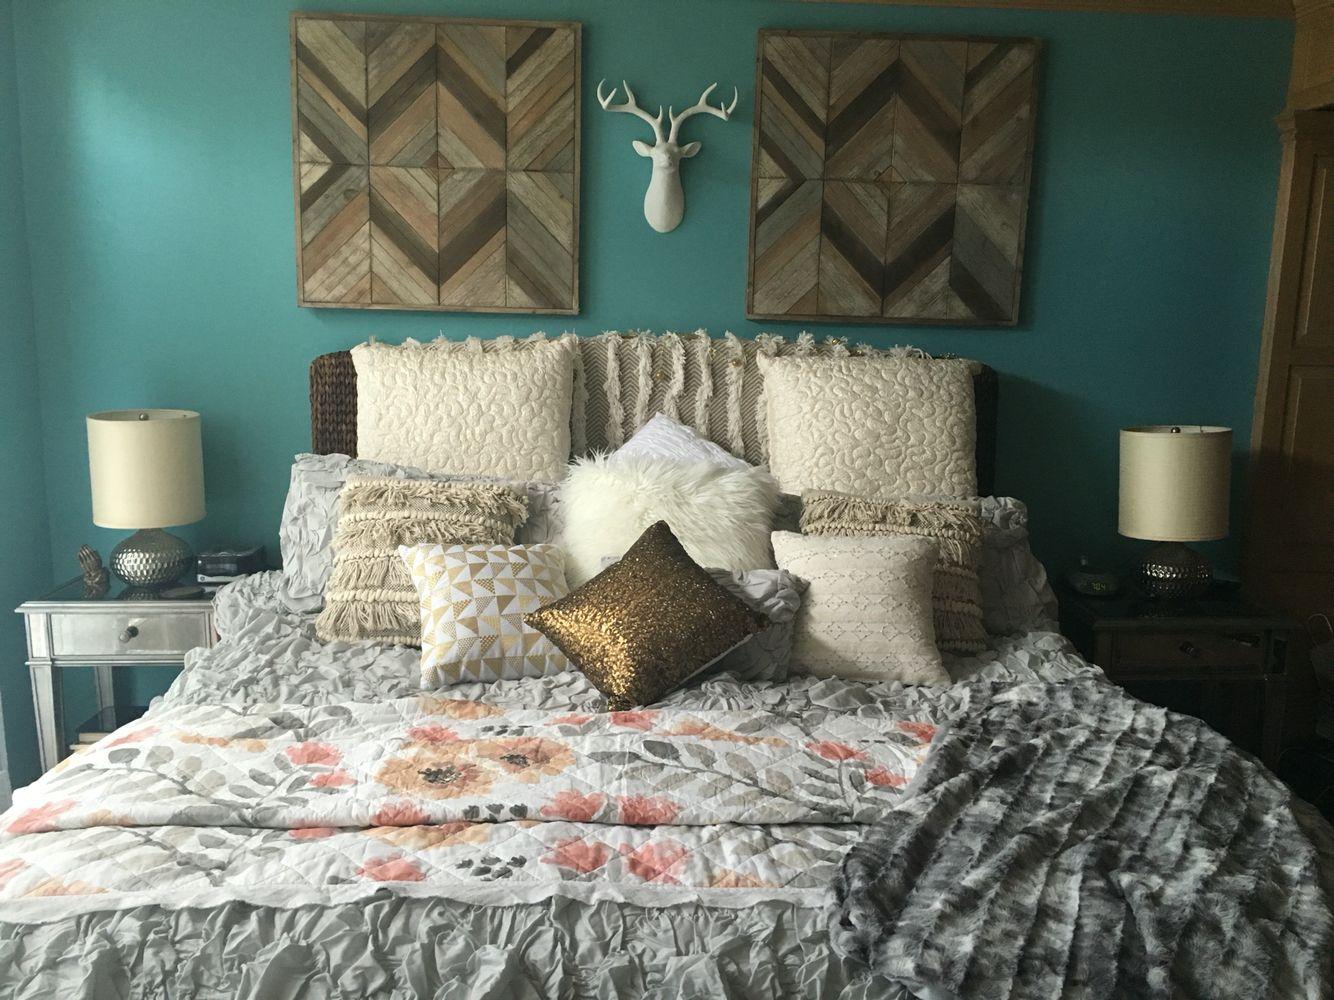 Boho rustic glam bedroom | Home Decor | Pinterest | Glam ...